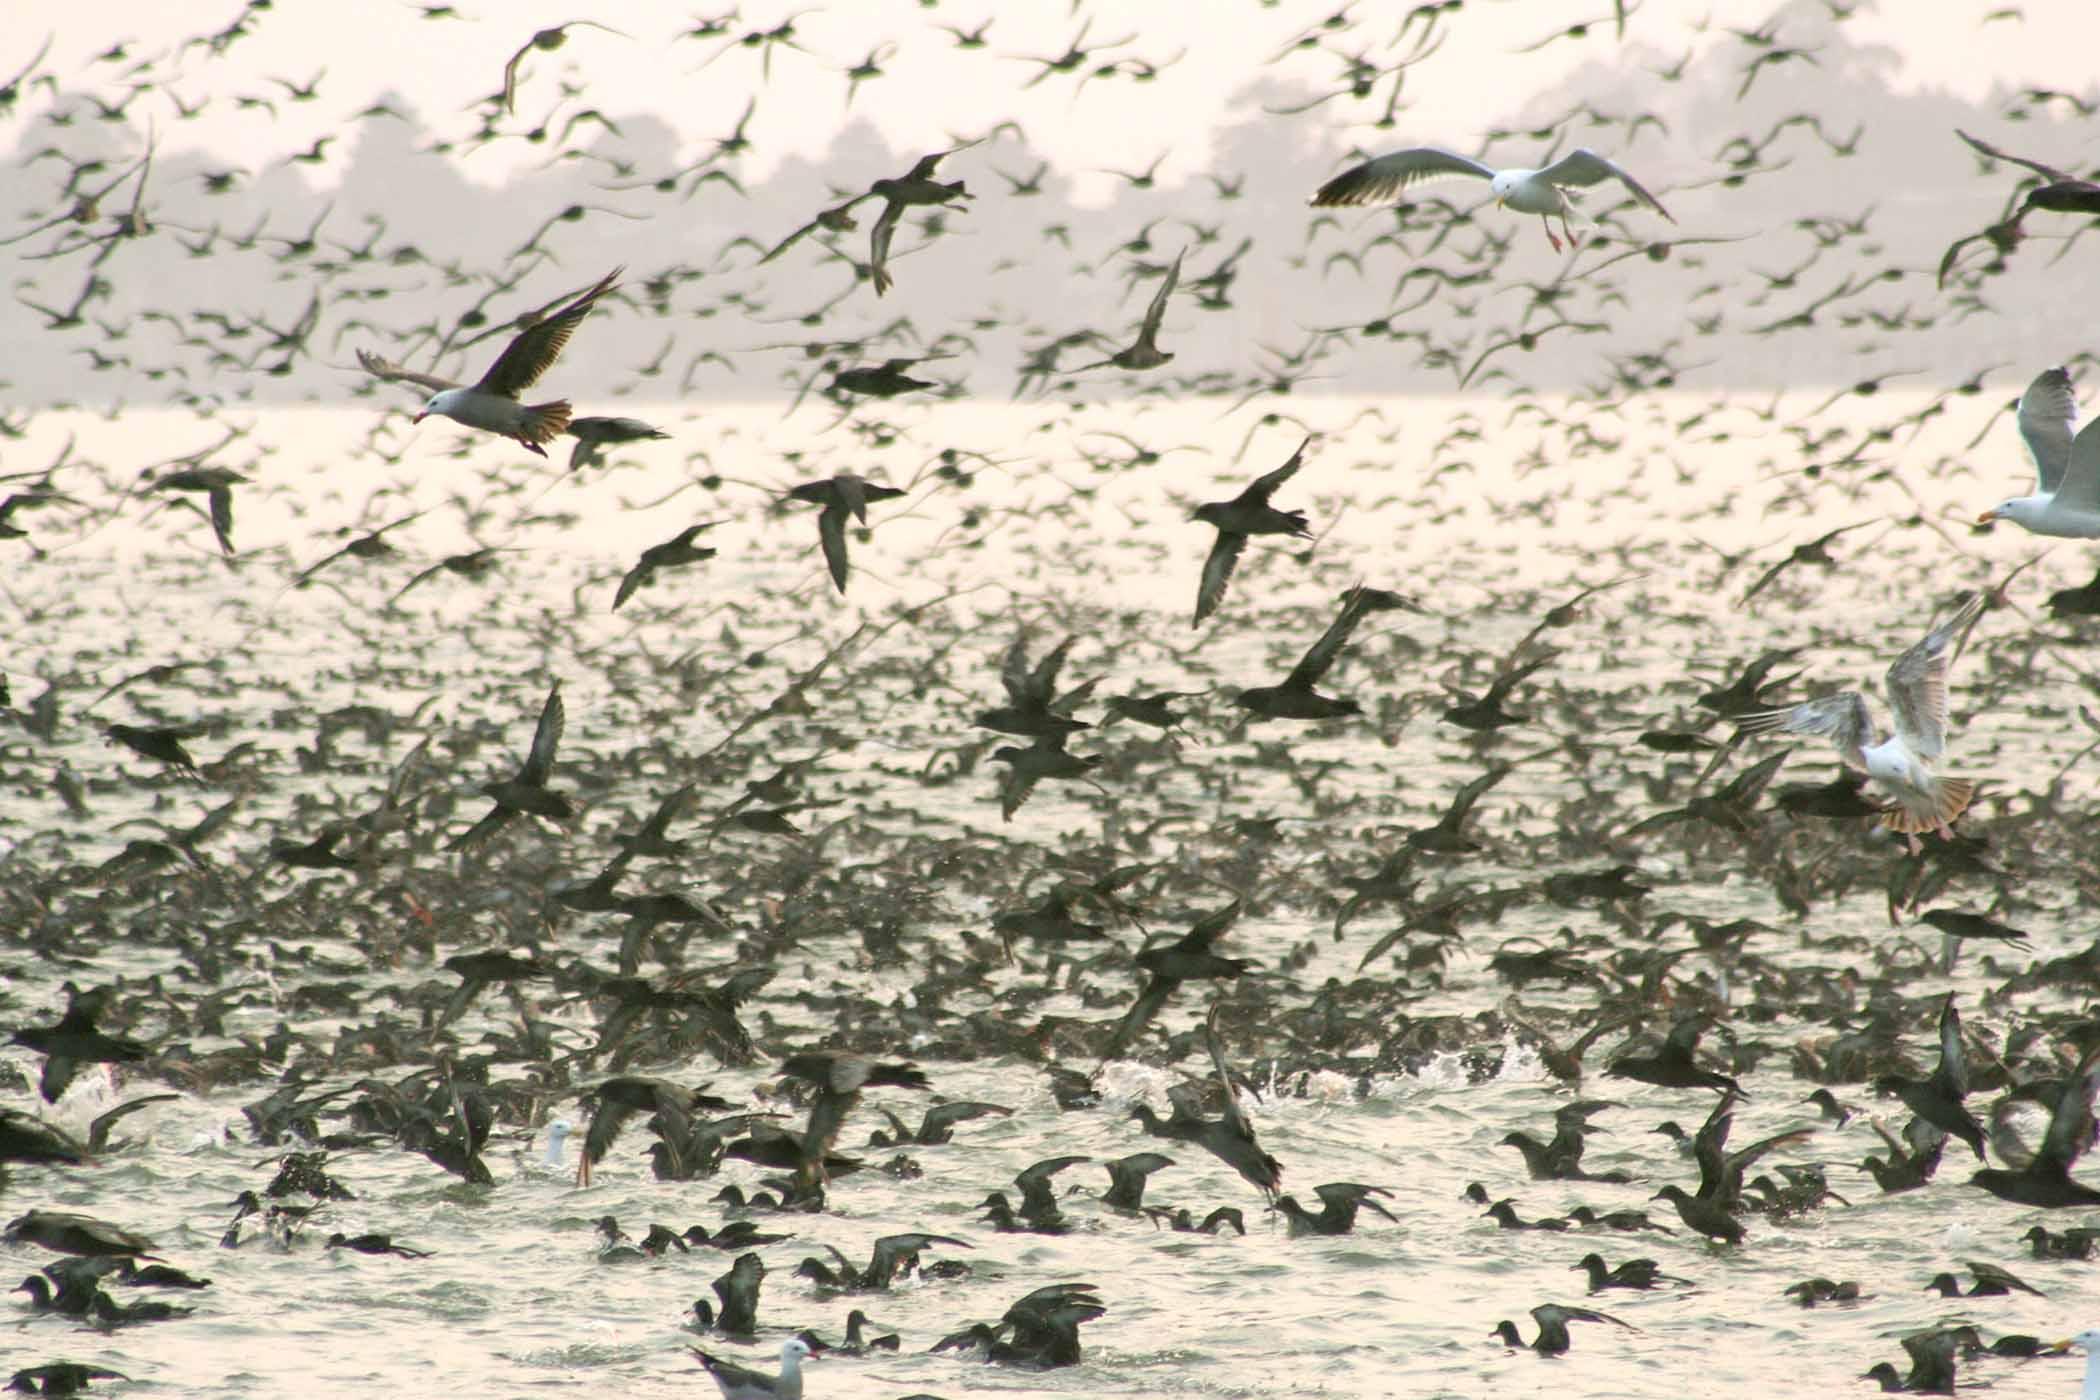 Sooty shearwaters, seagulls, and pelicans in a feeding frenzy — Aptos, California